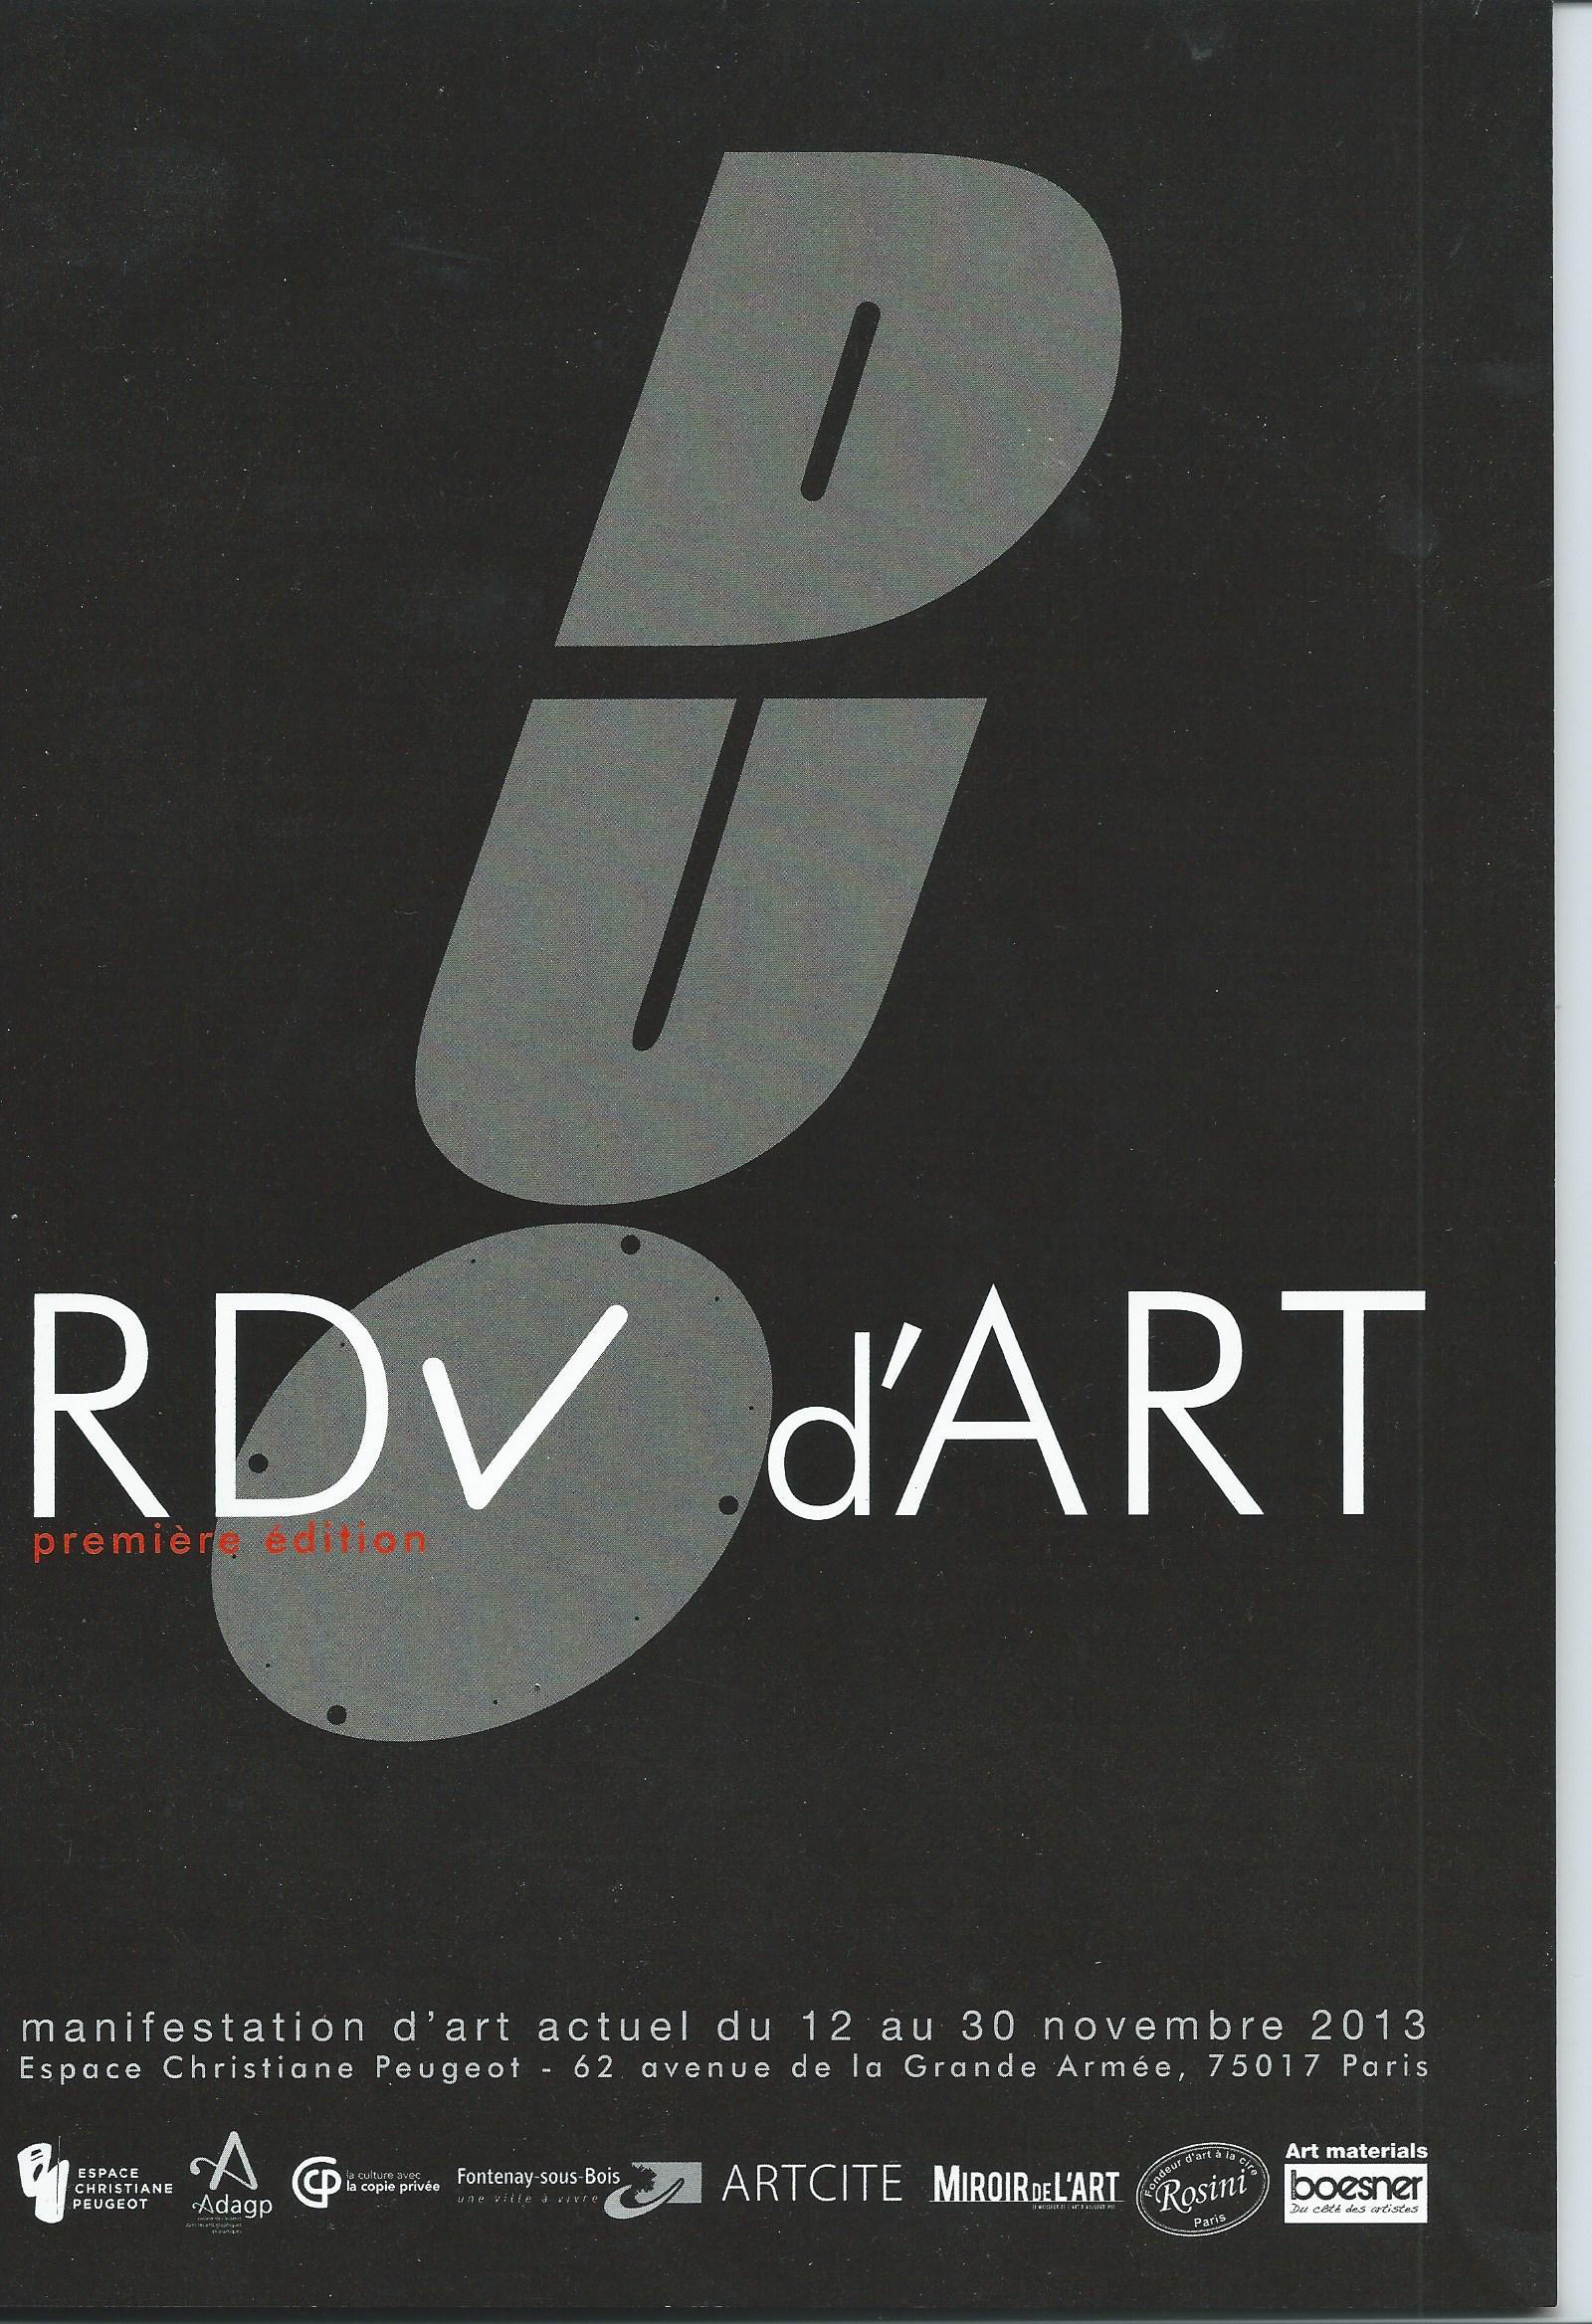 RDV d'art 2013